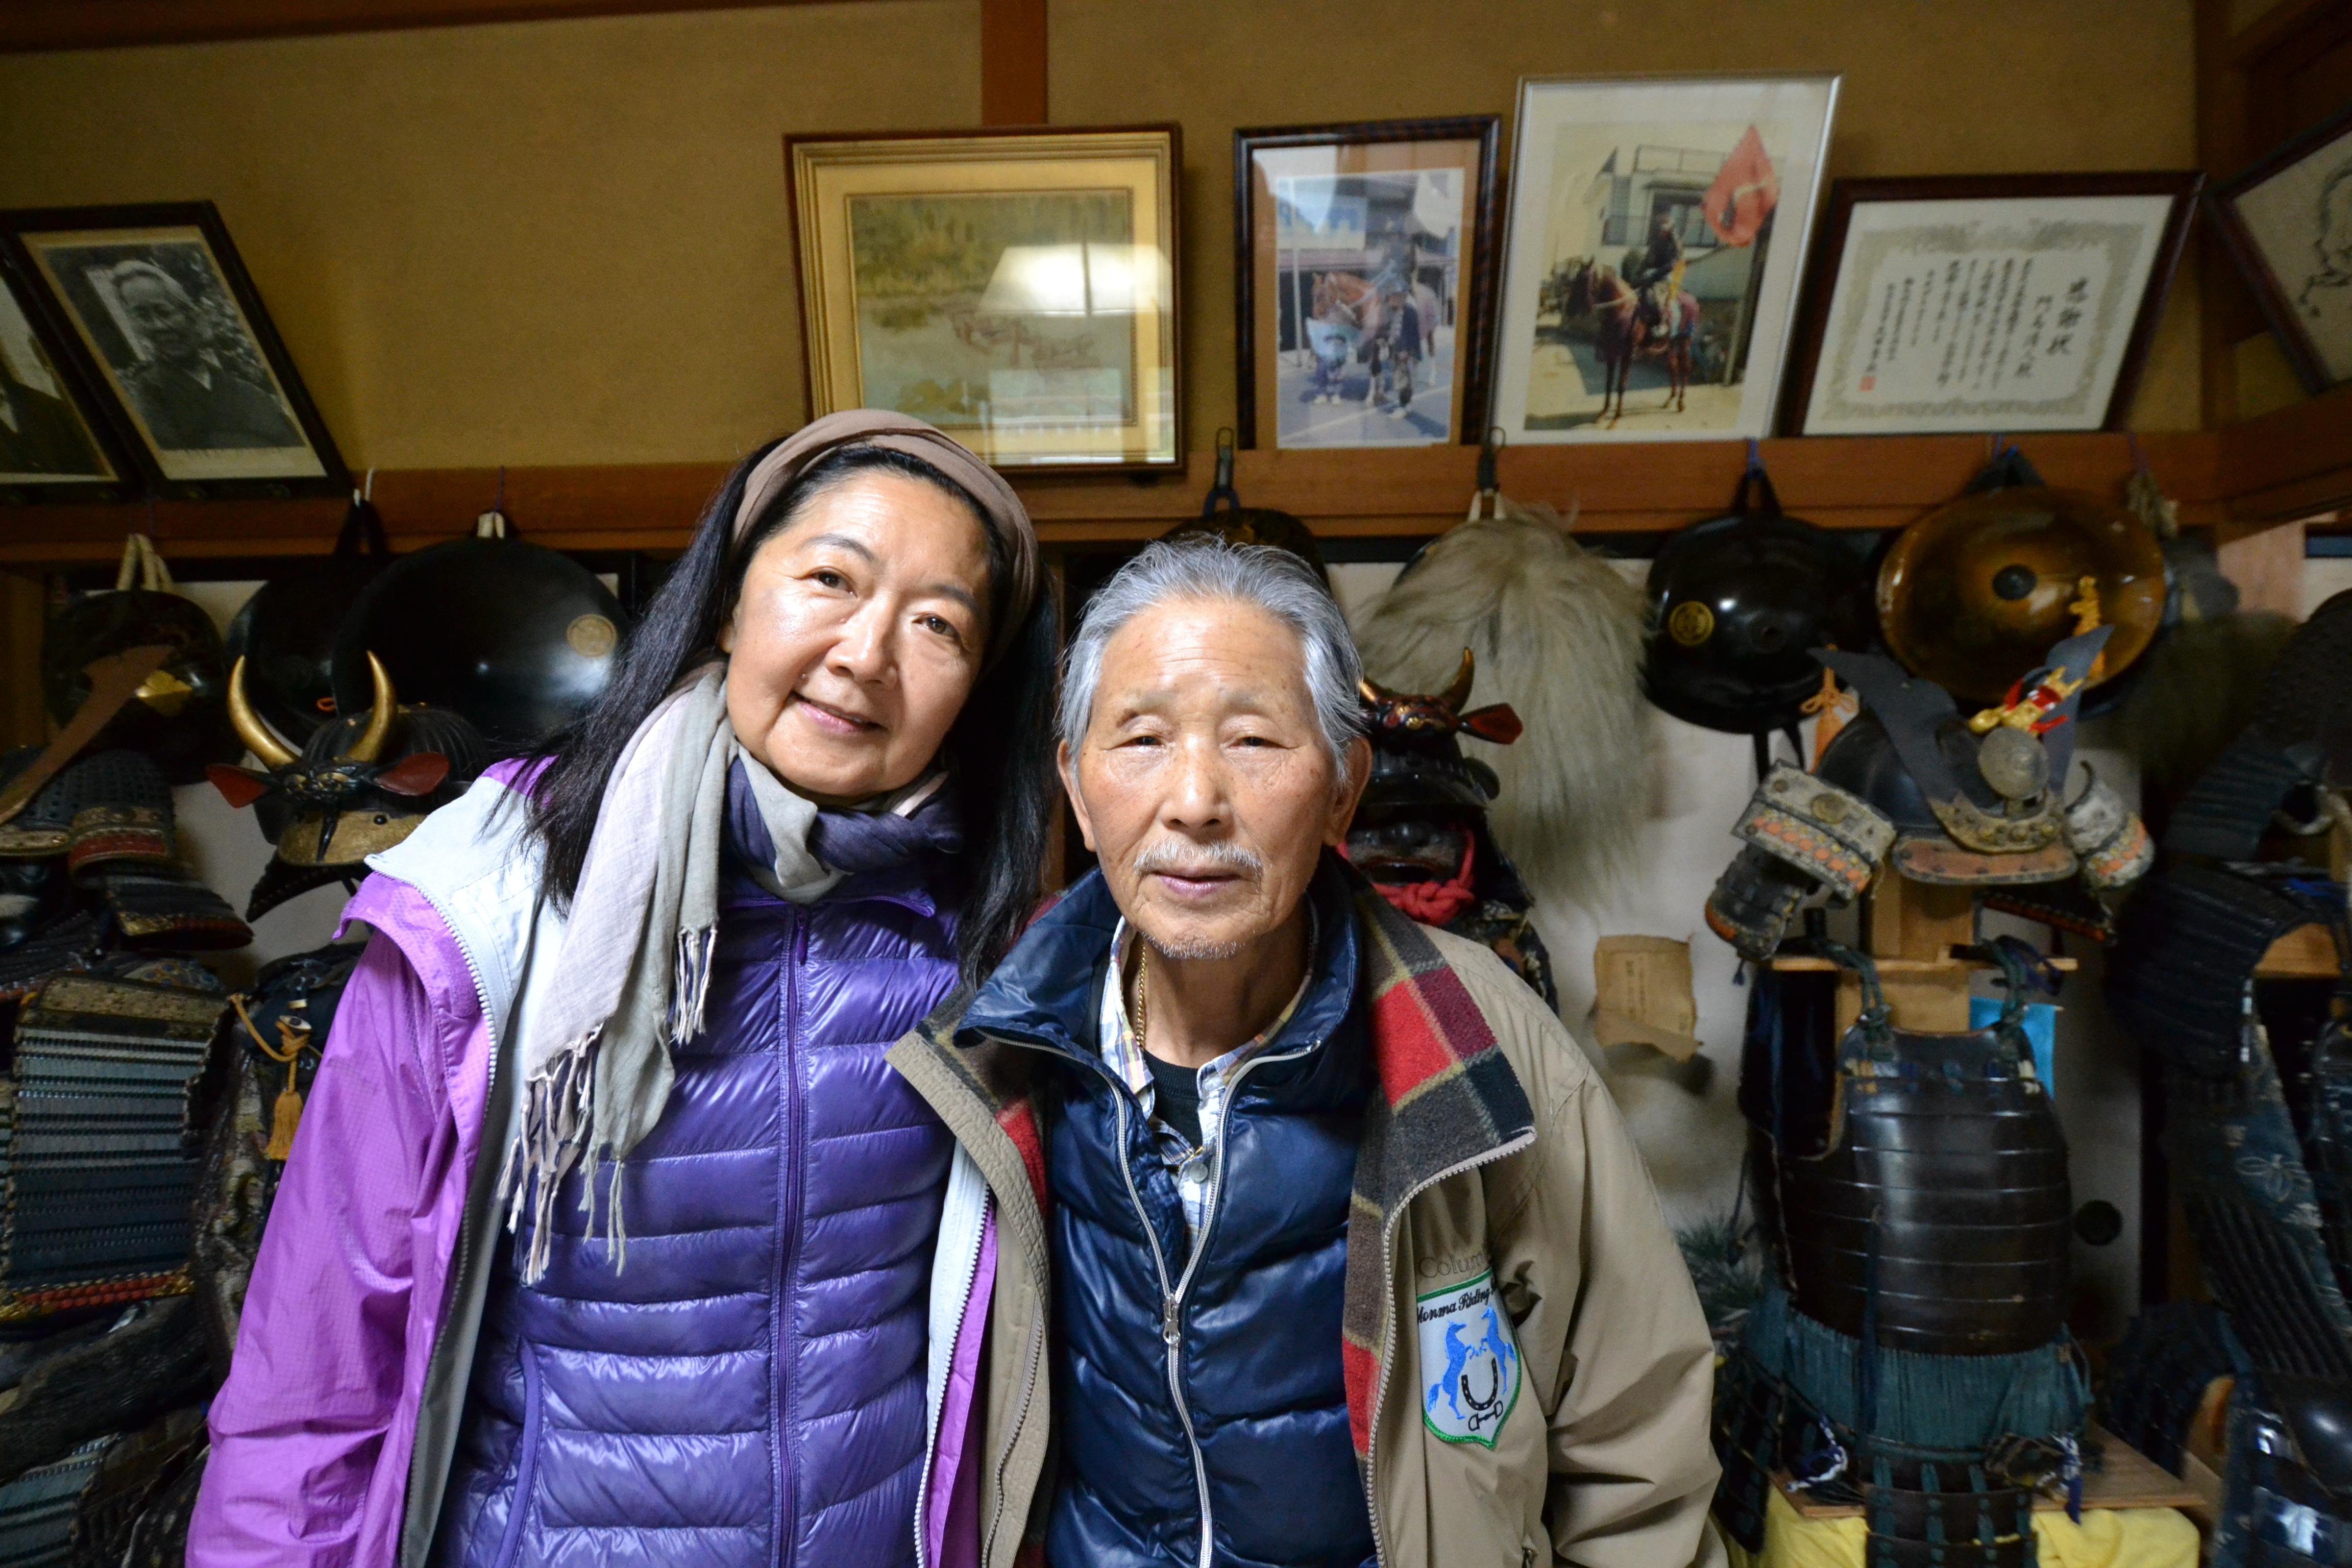 minamisoma samurai and linda armor.JPG